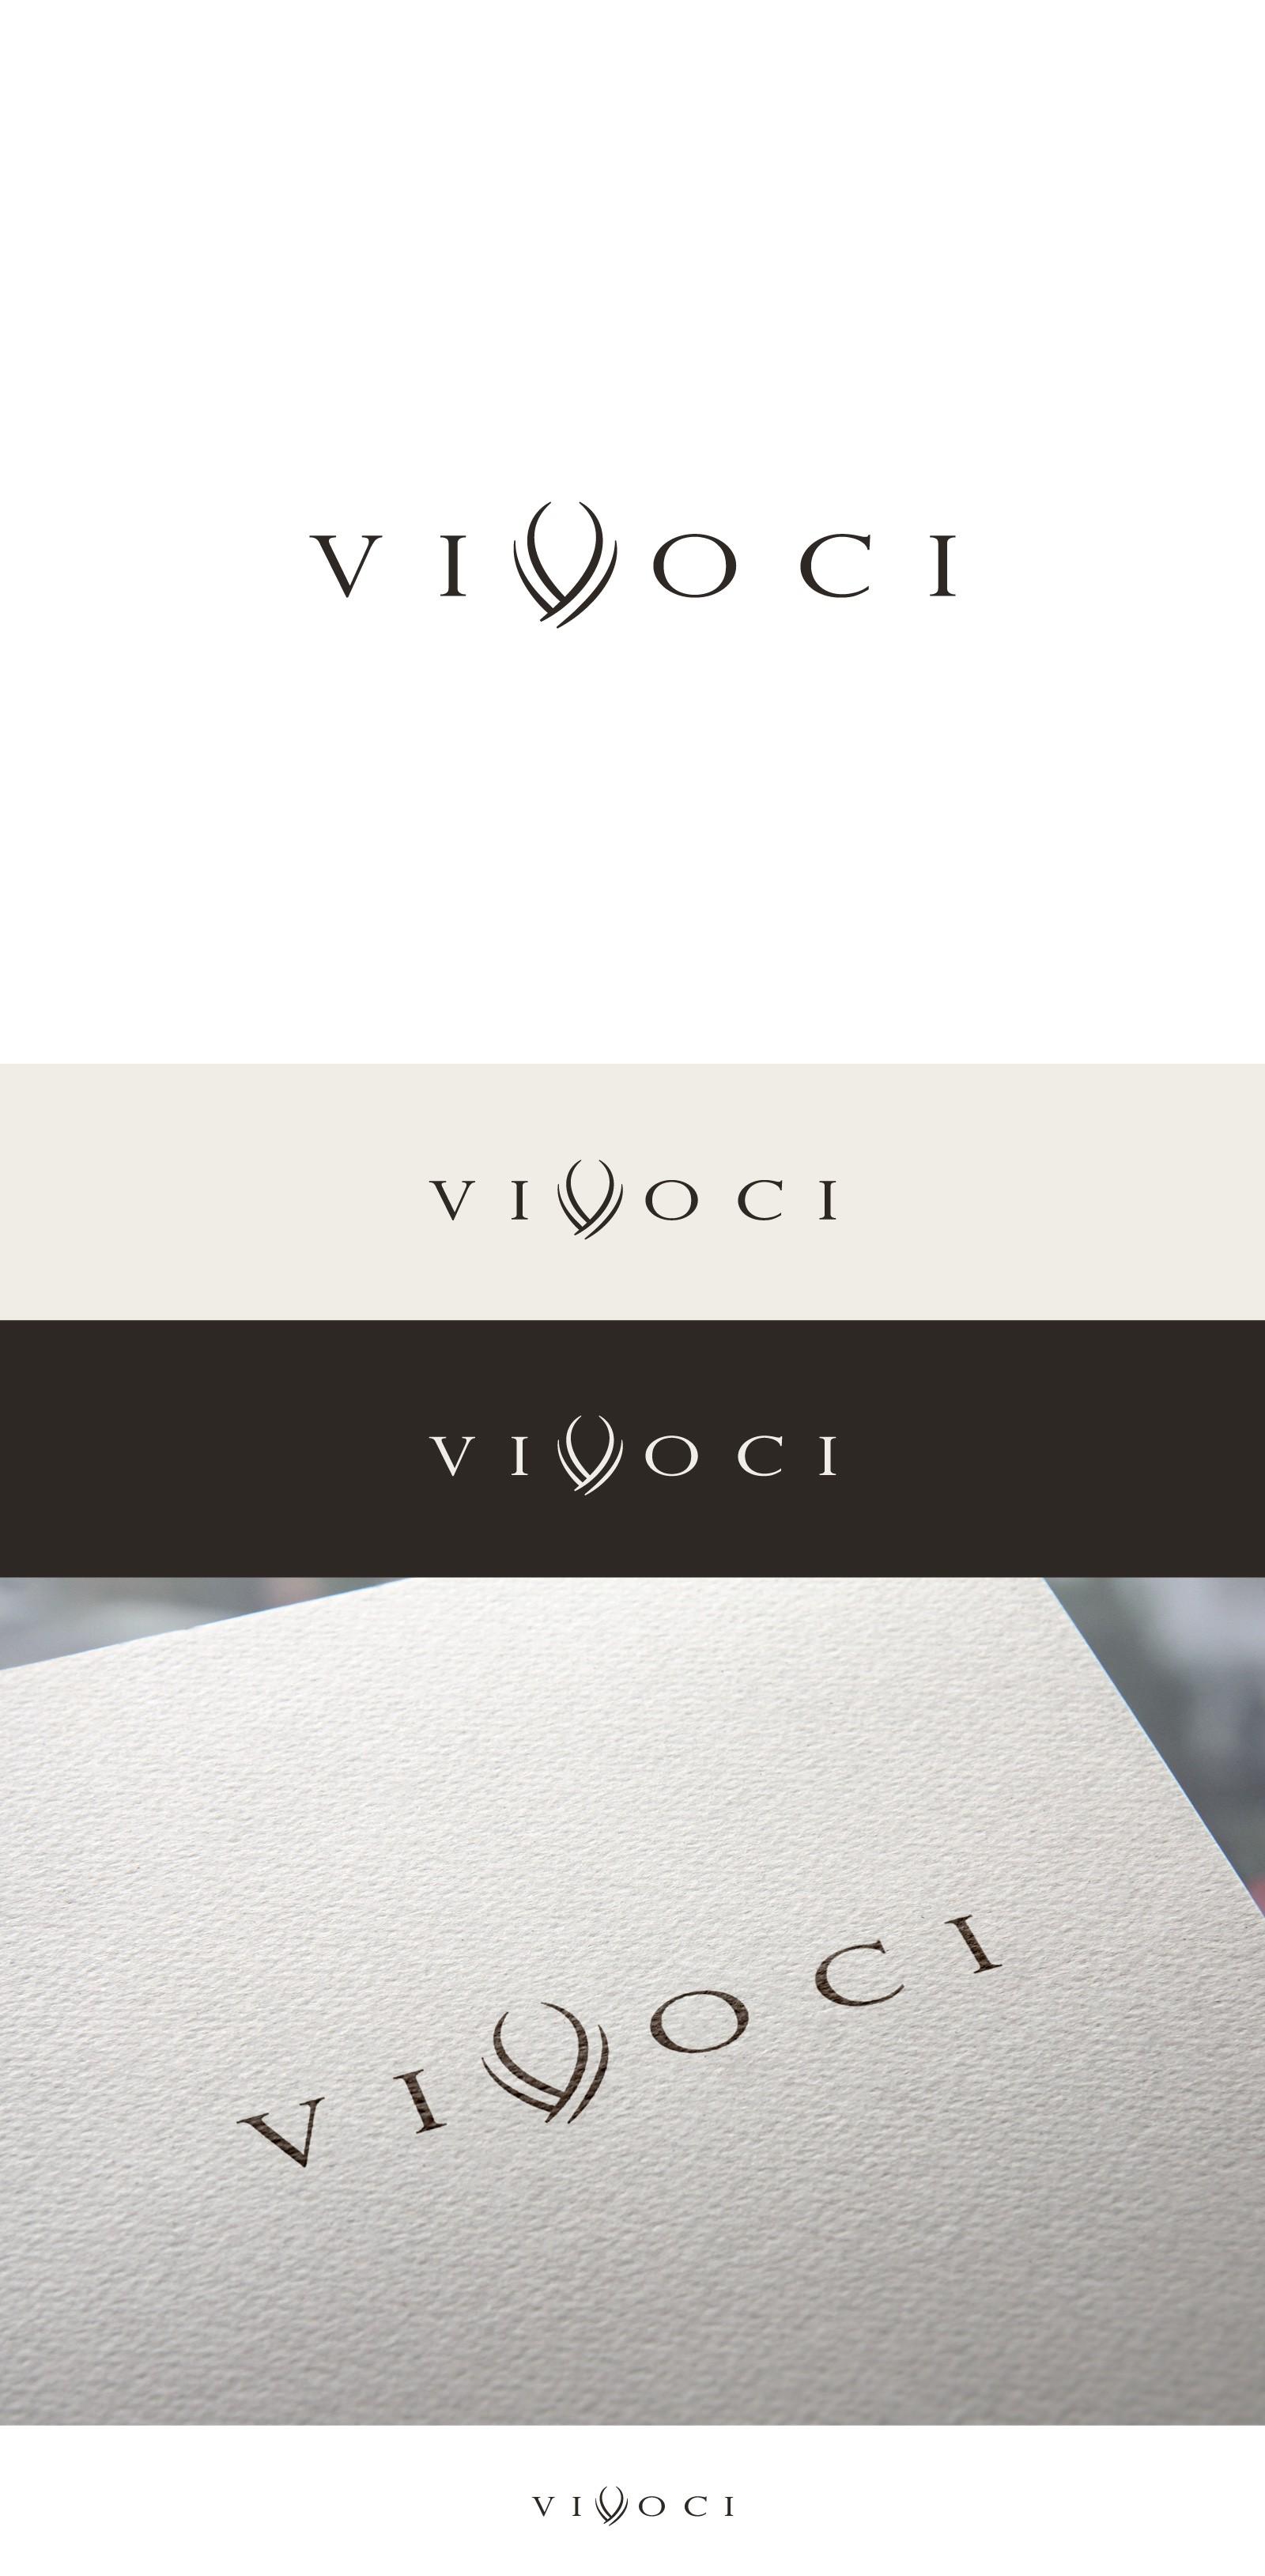 Design a stunning logo for Vivoci hair salon/clinic